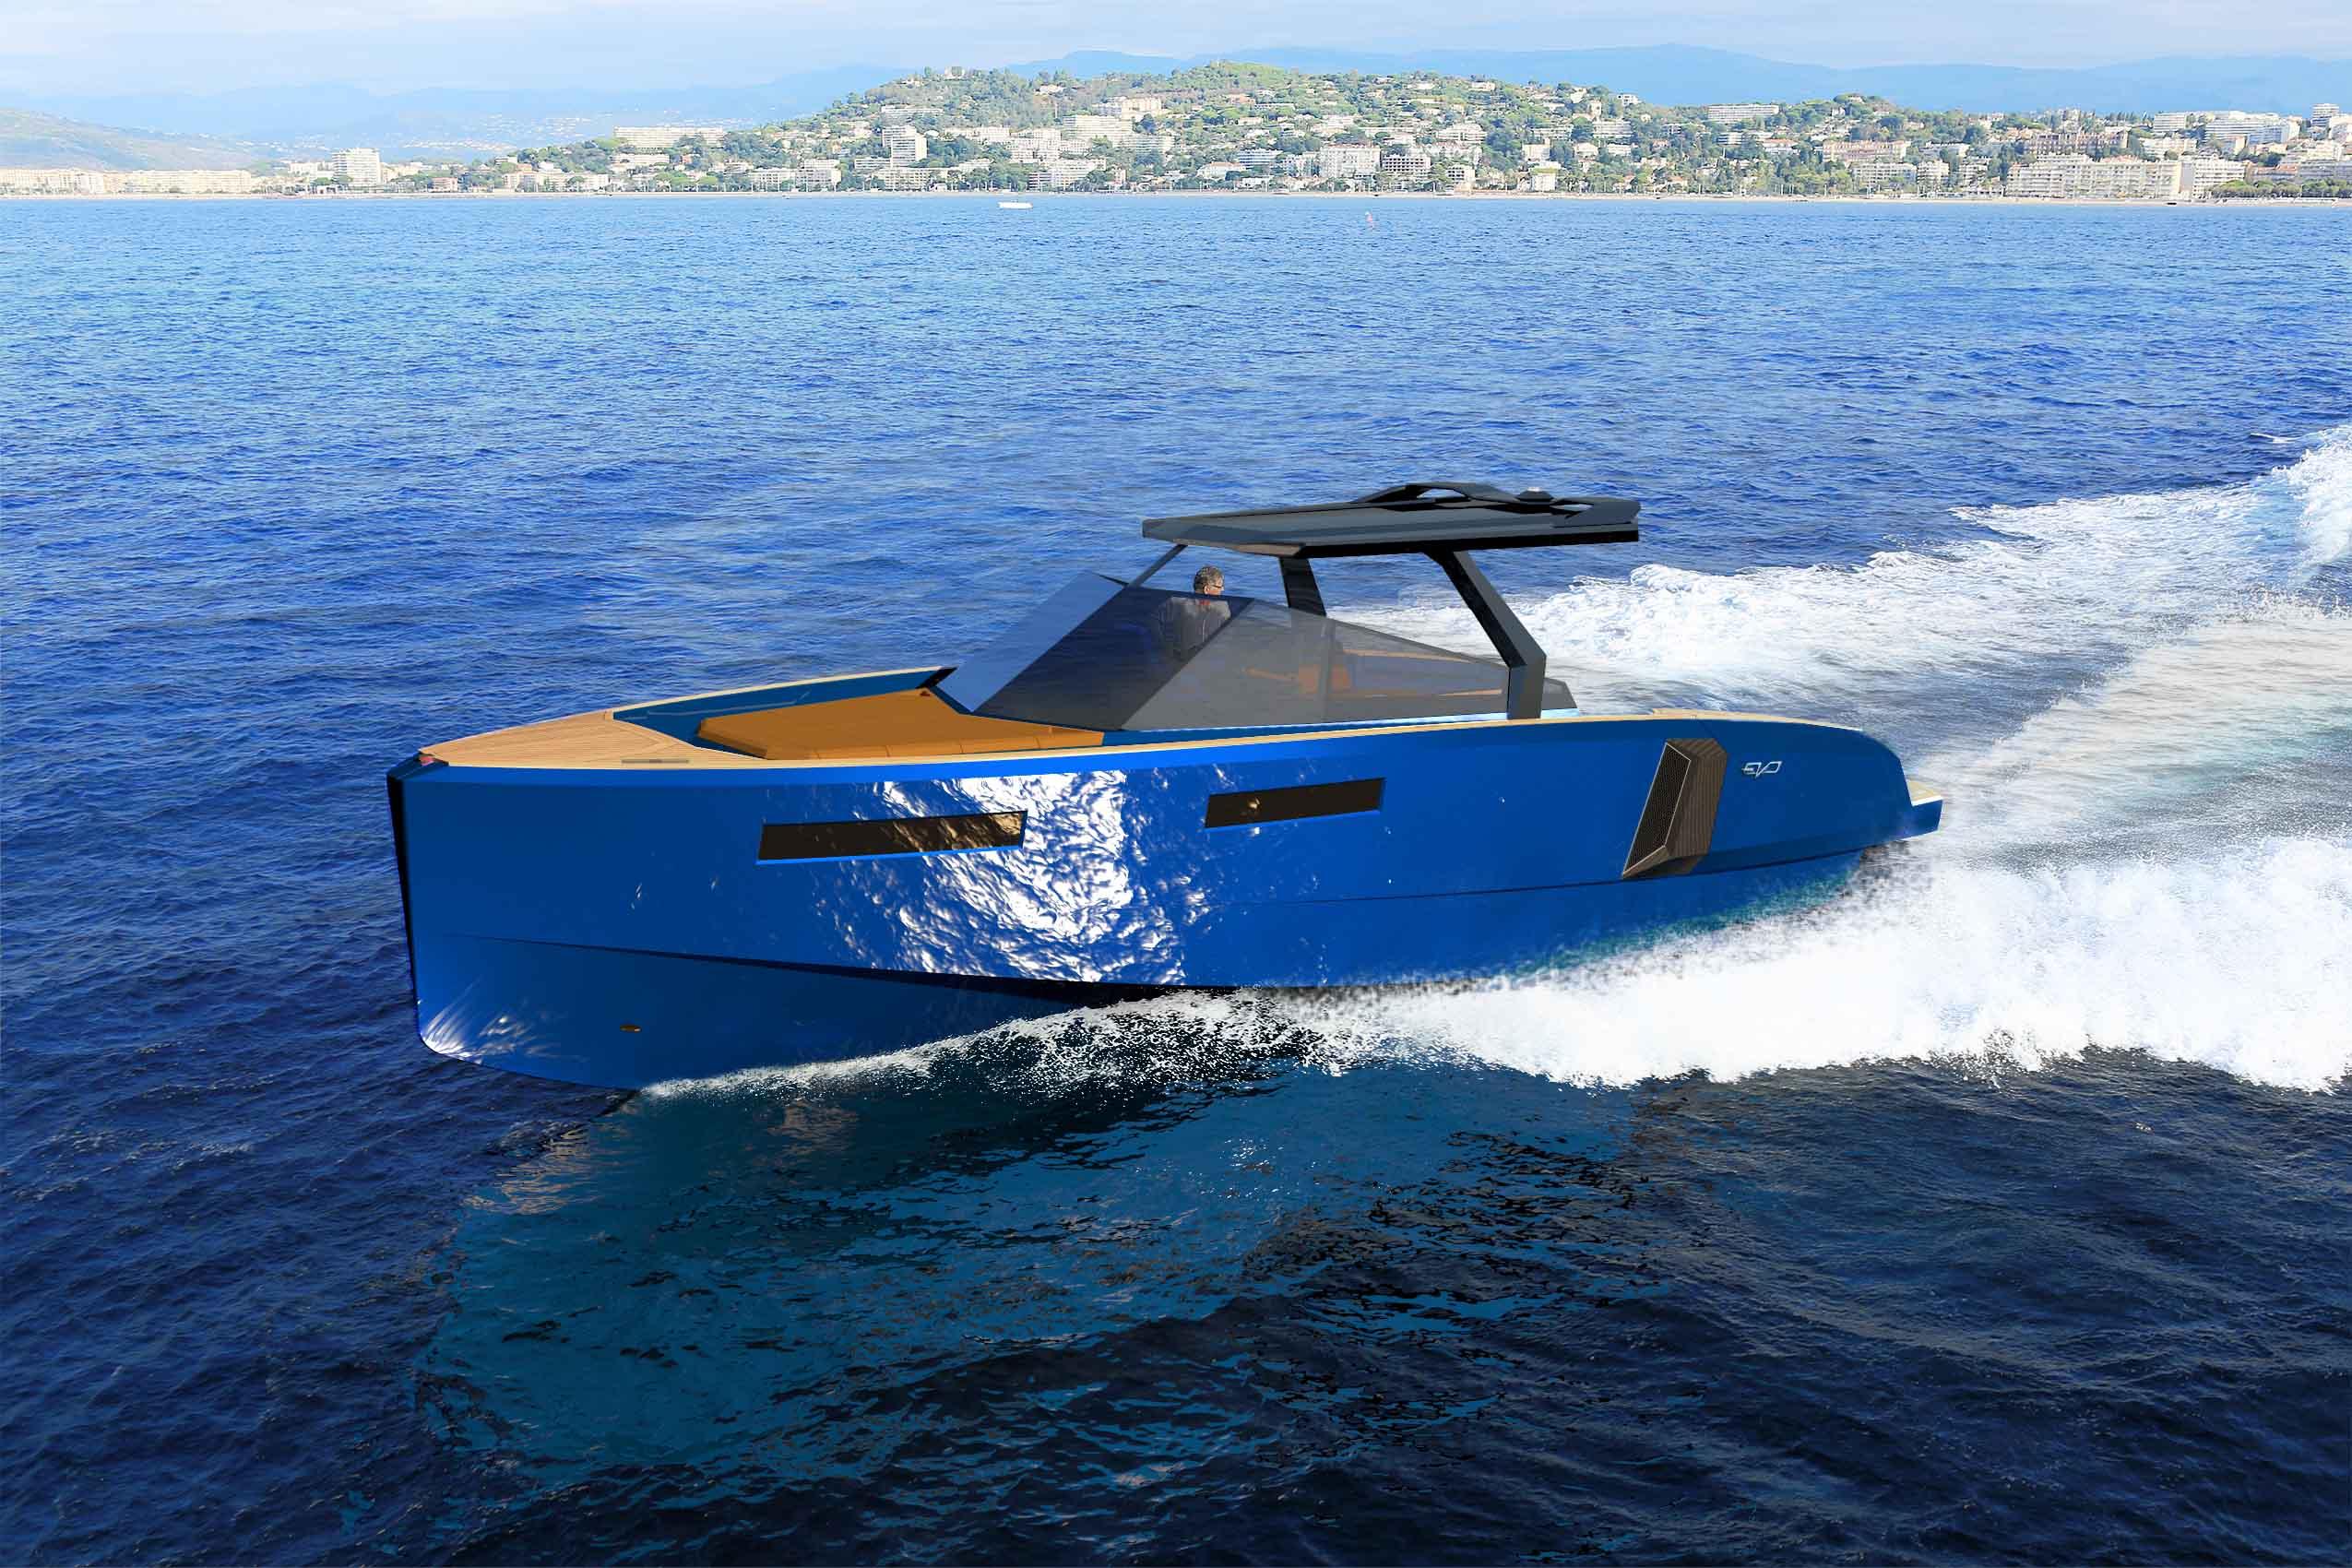 evo-yachts-extends-it's-range-with-evo-wa